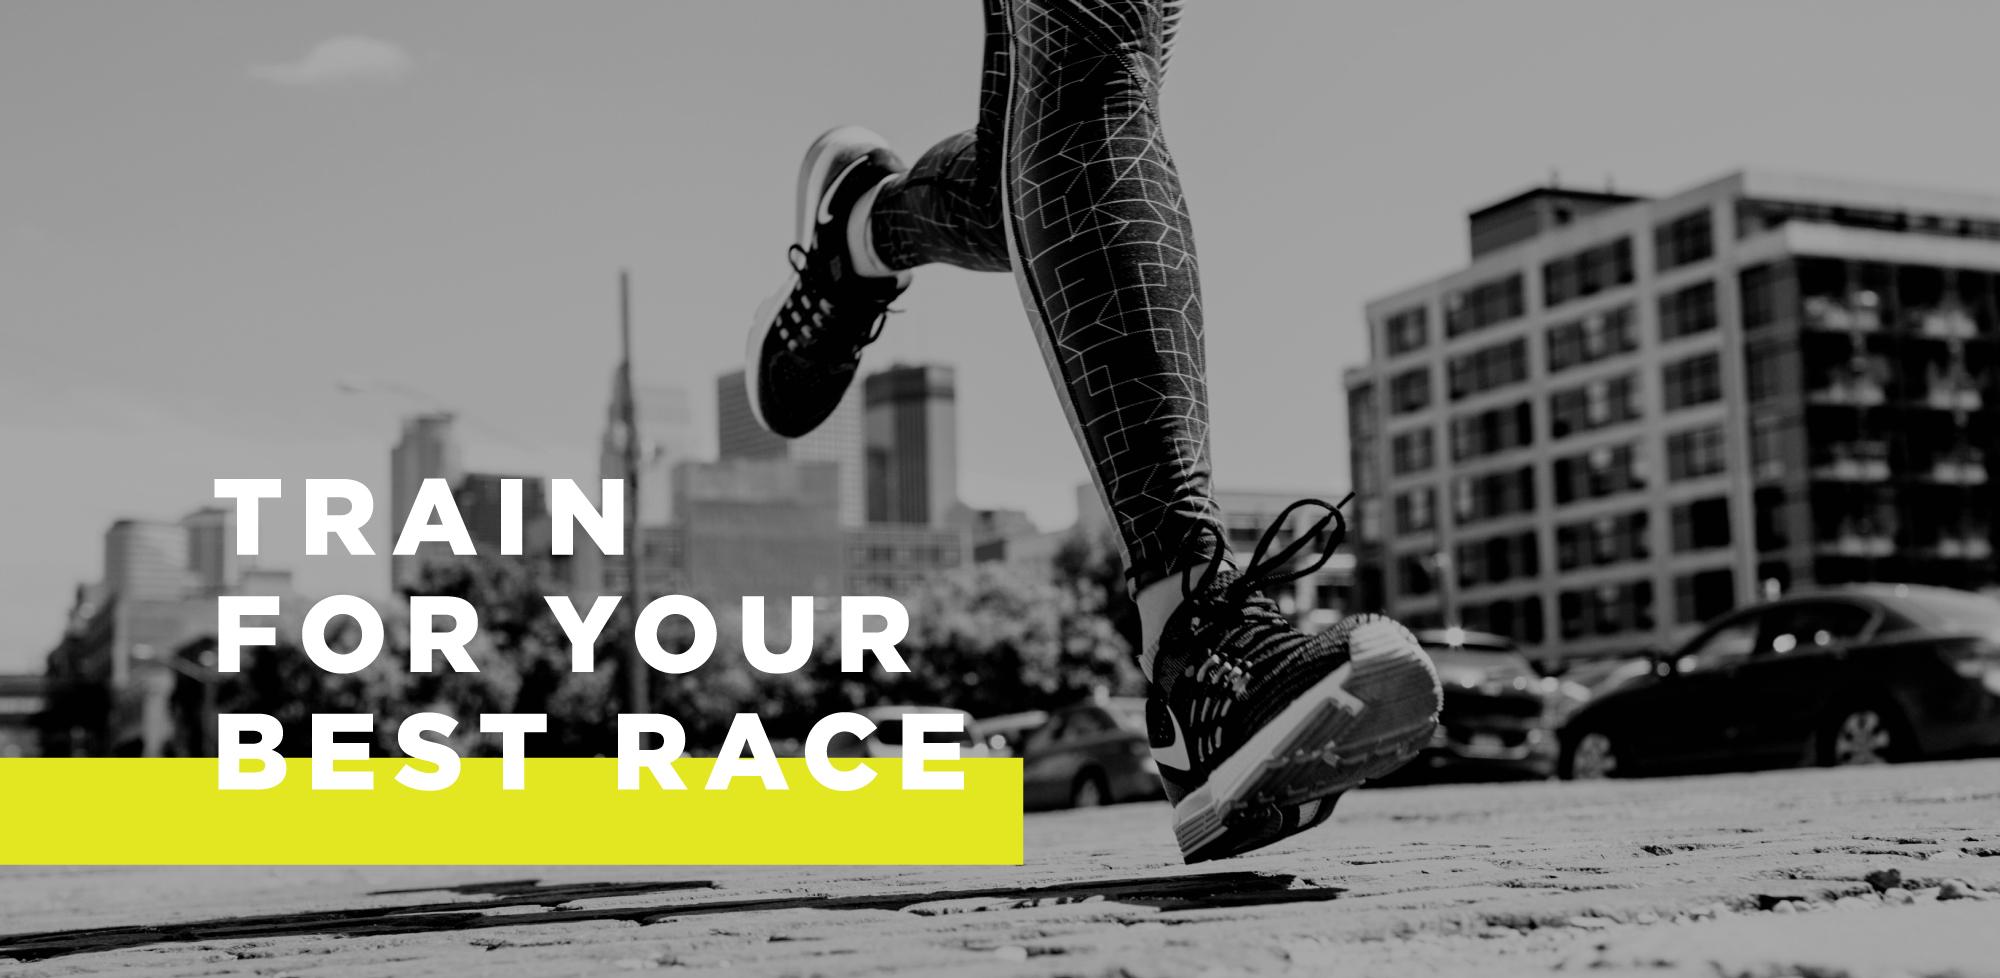 Fly Feet Running - Race Training